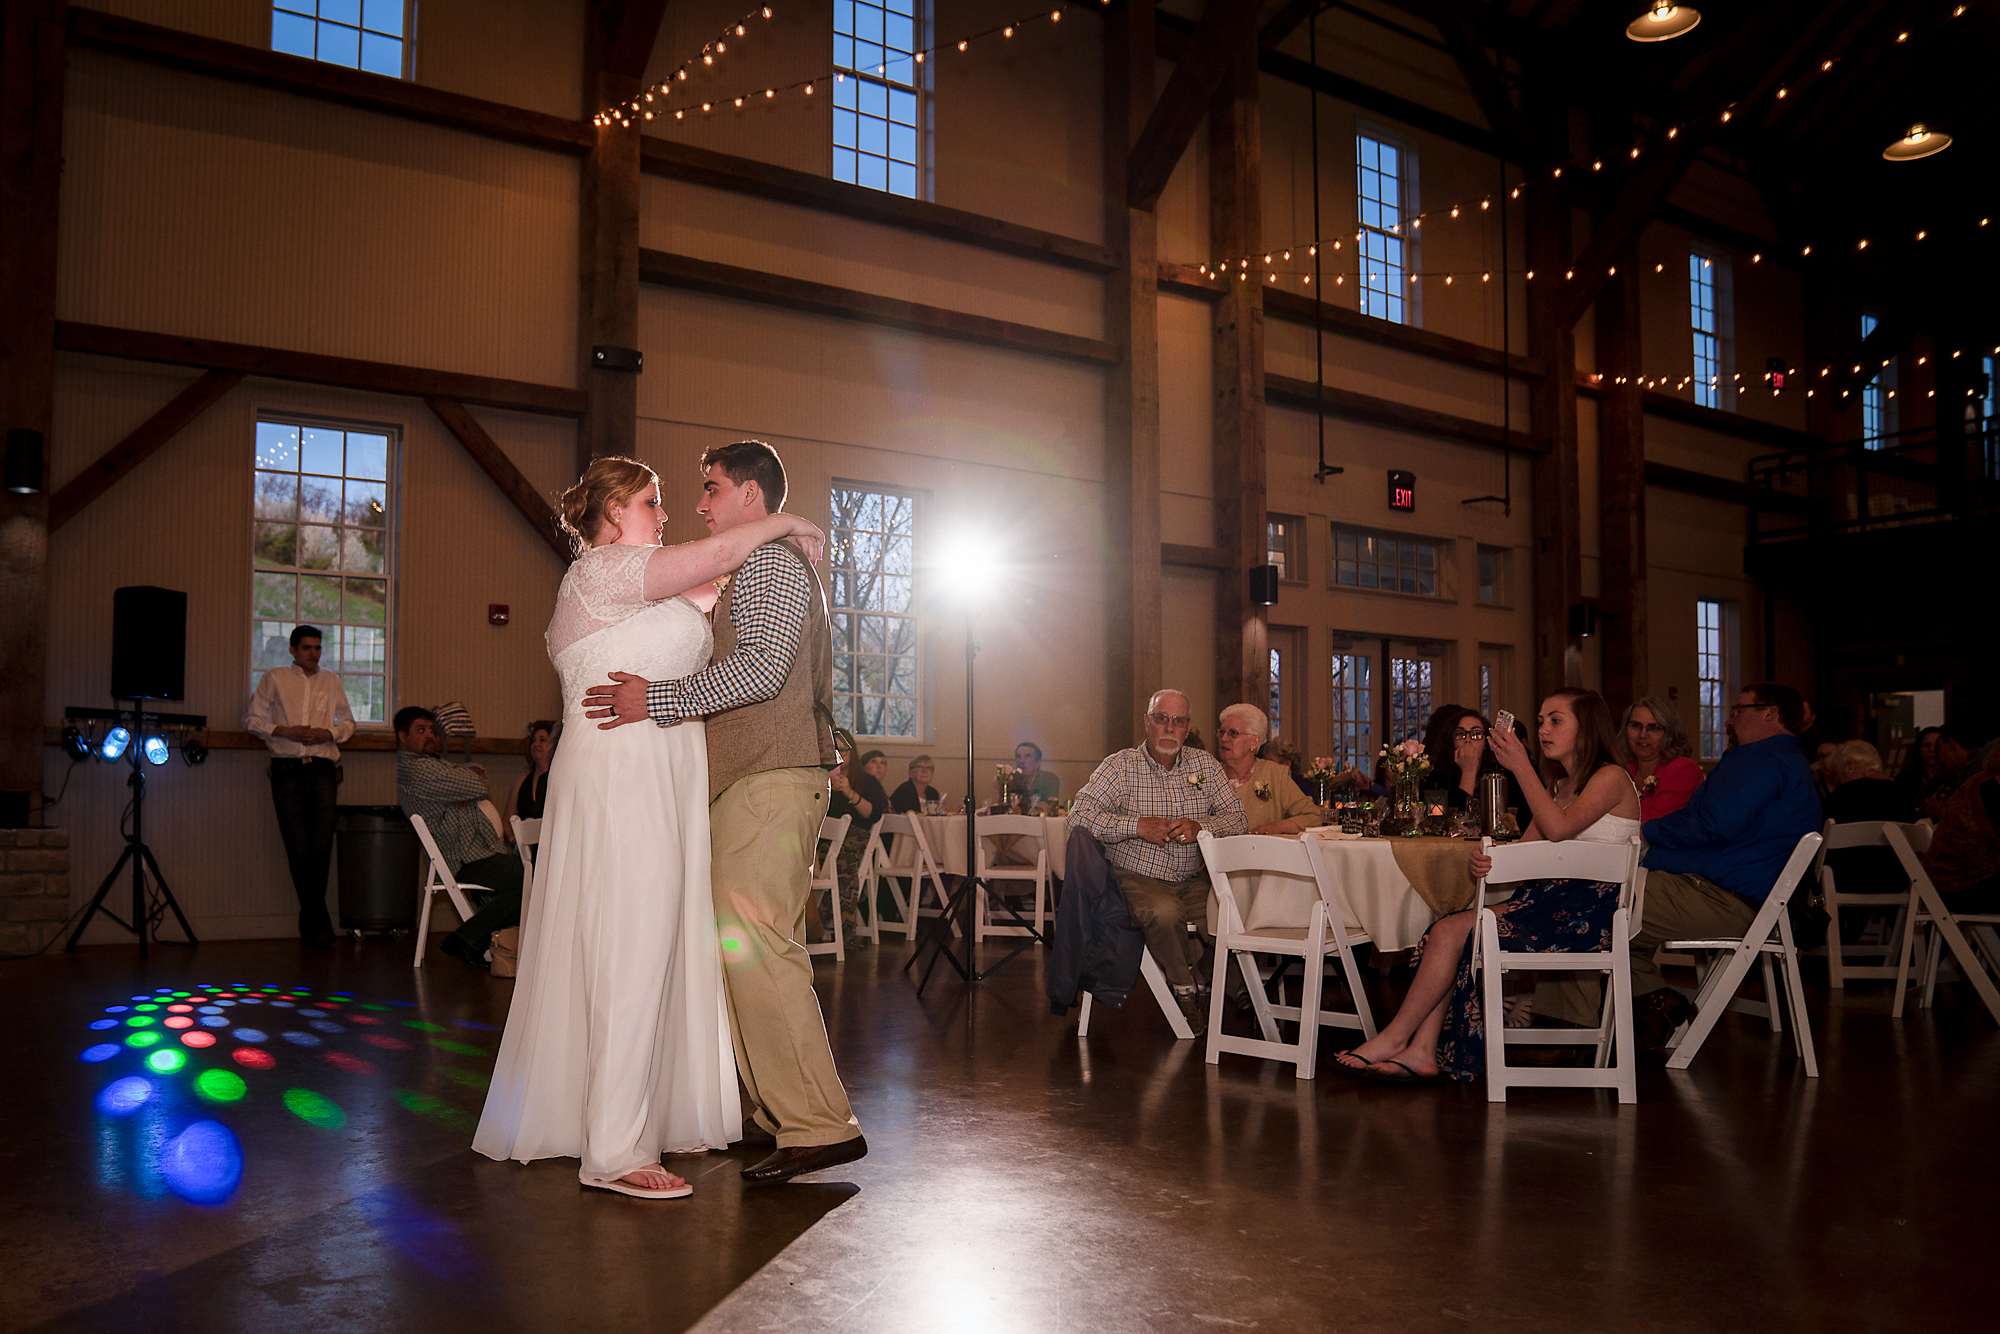 Muhlhauser-Barn-Wedding-Photos-16.jpg